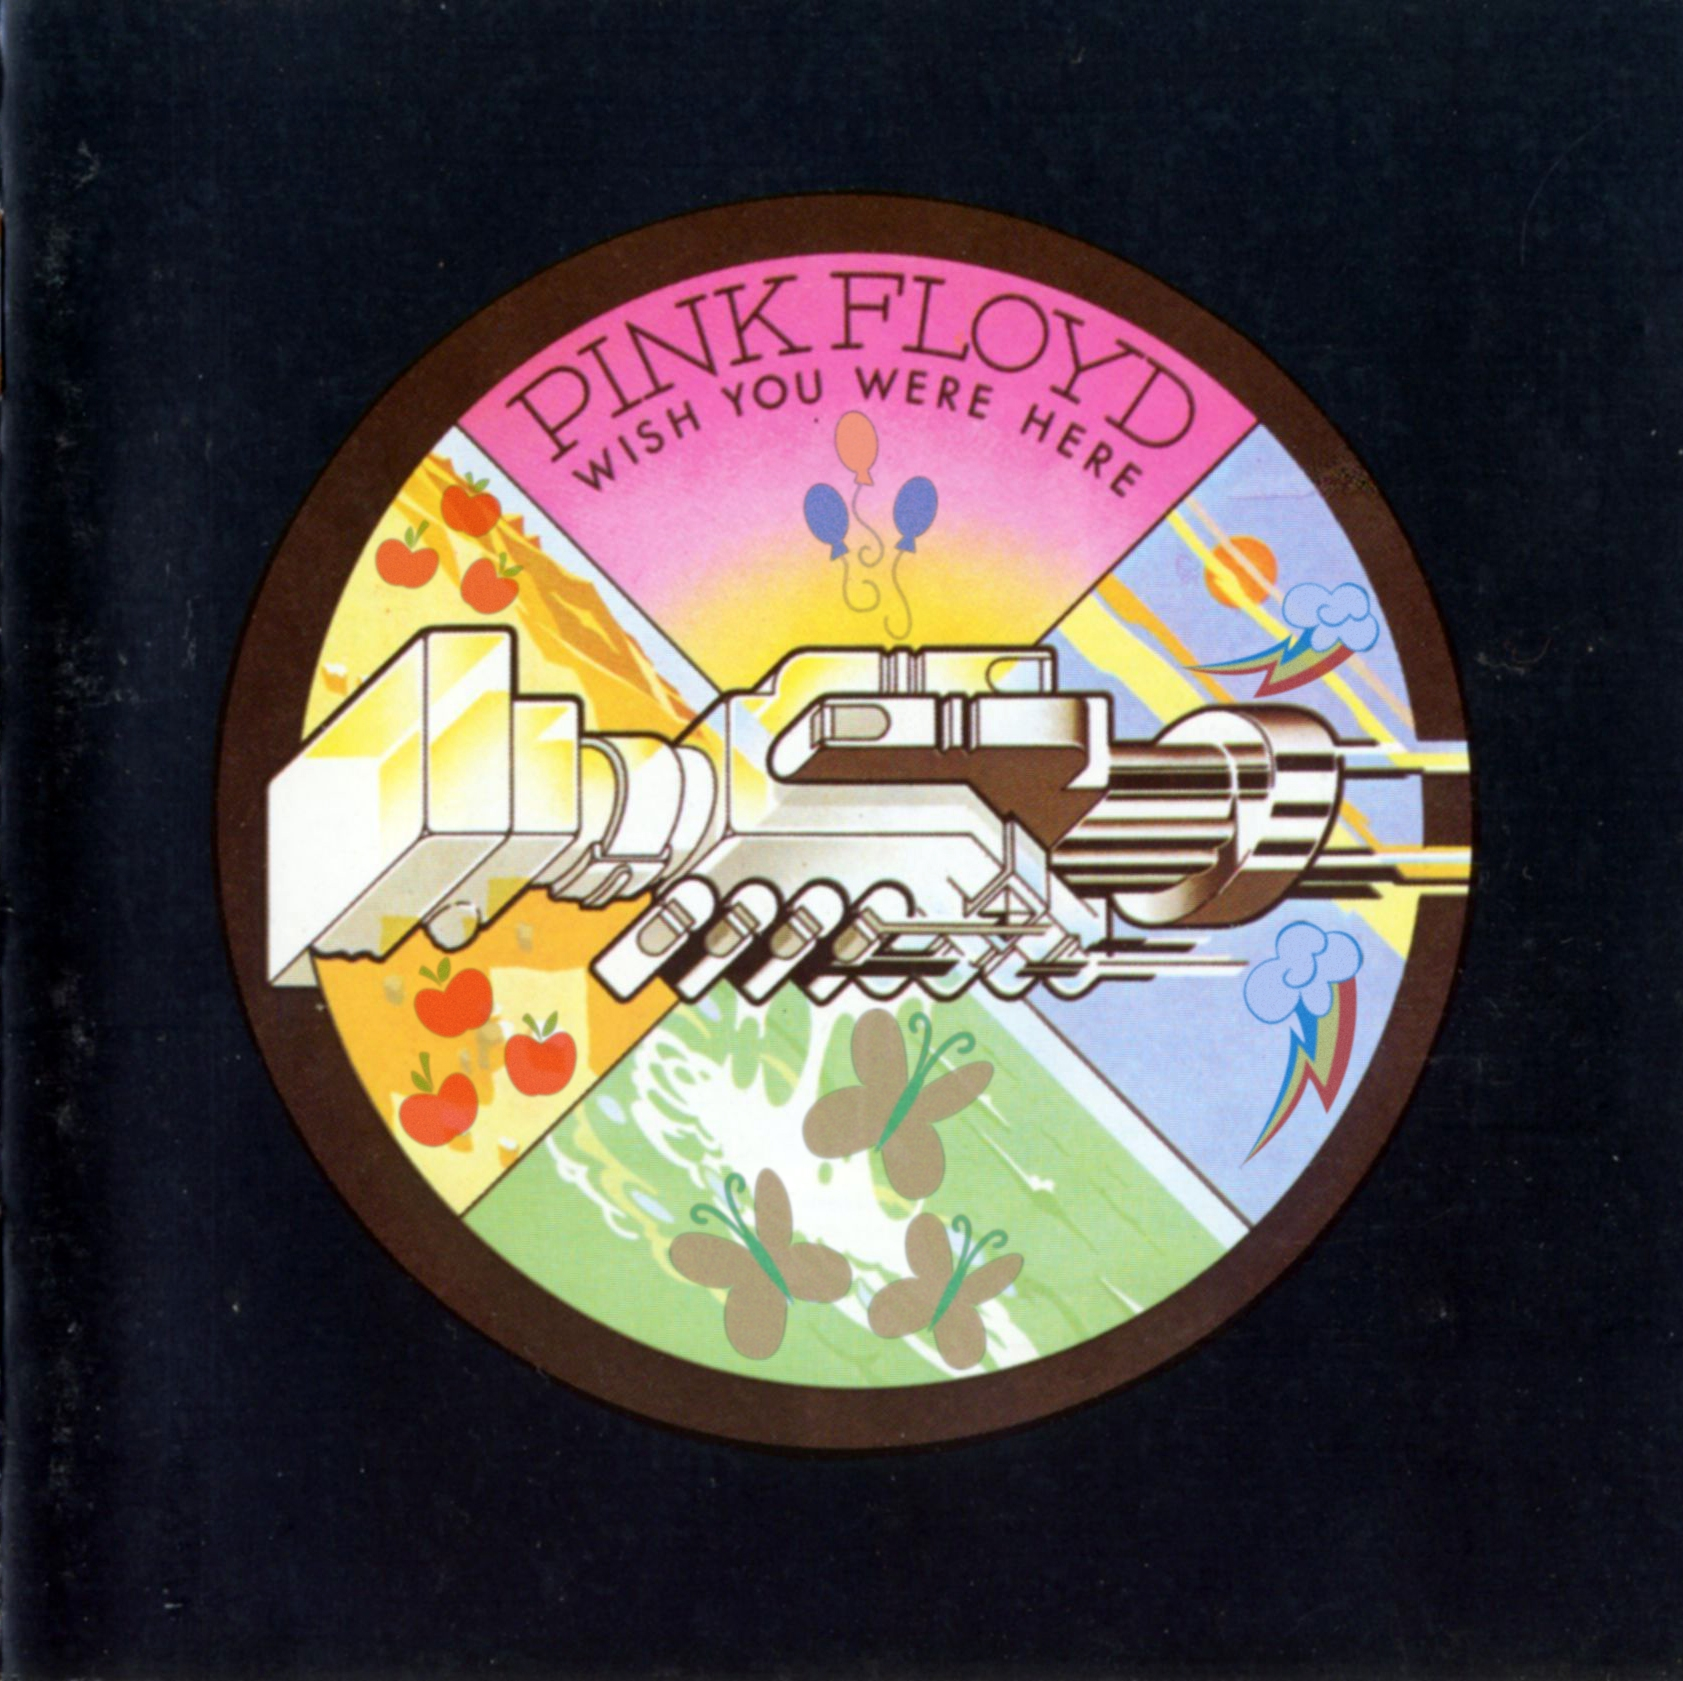 Rainbow Floyd by Oppositebros